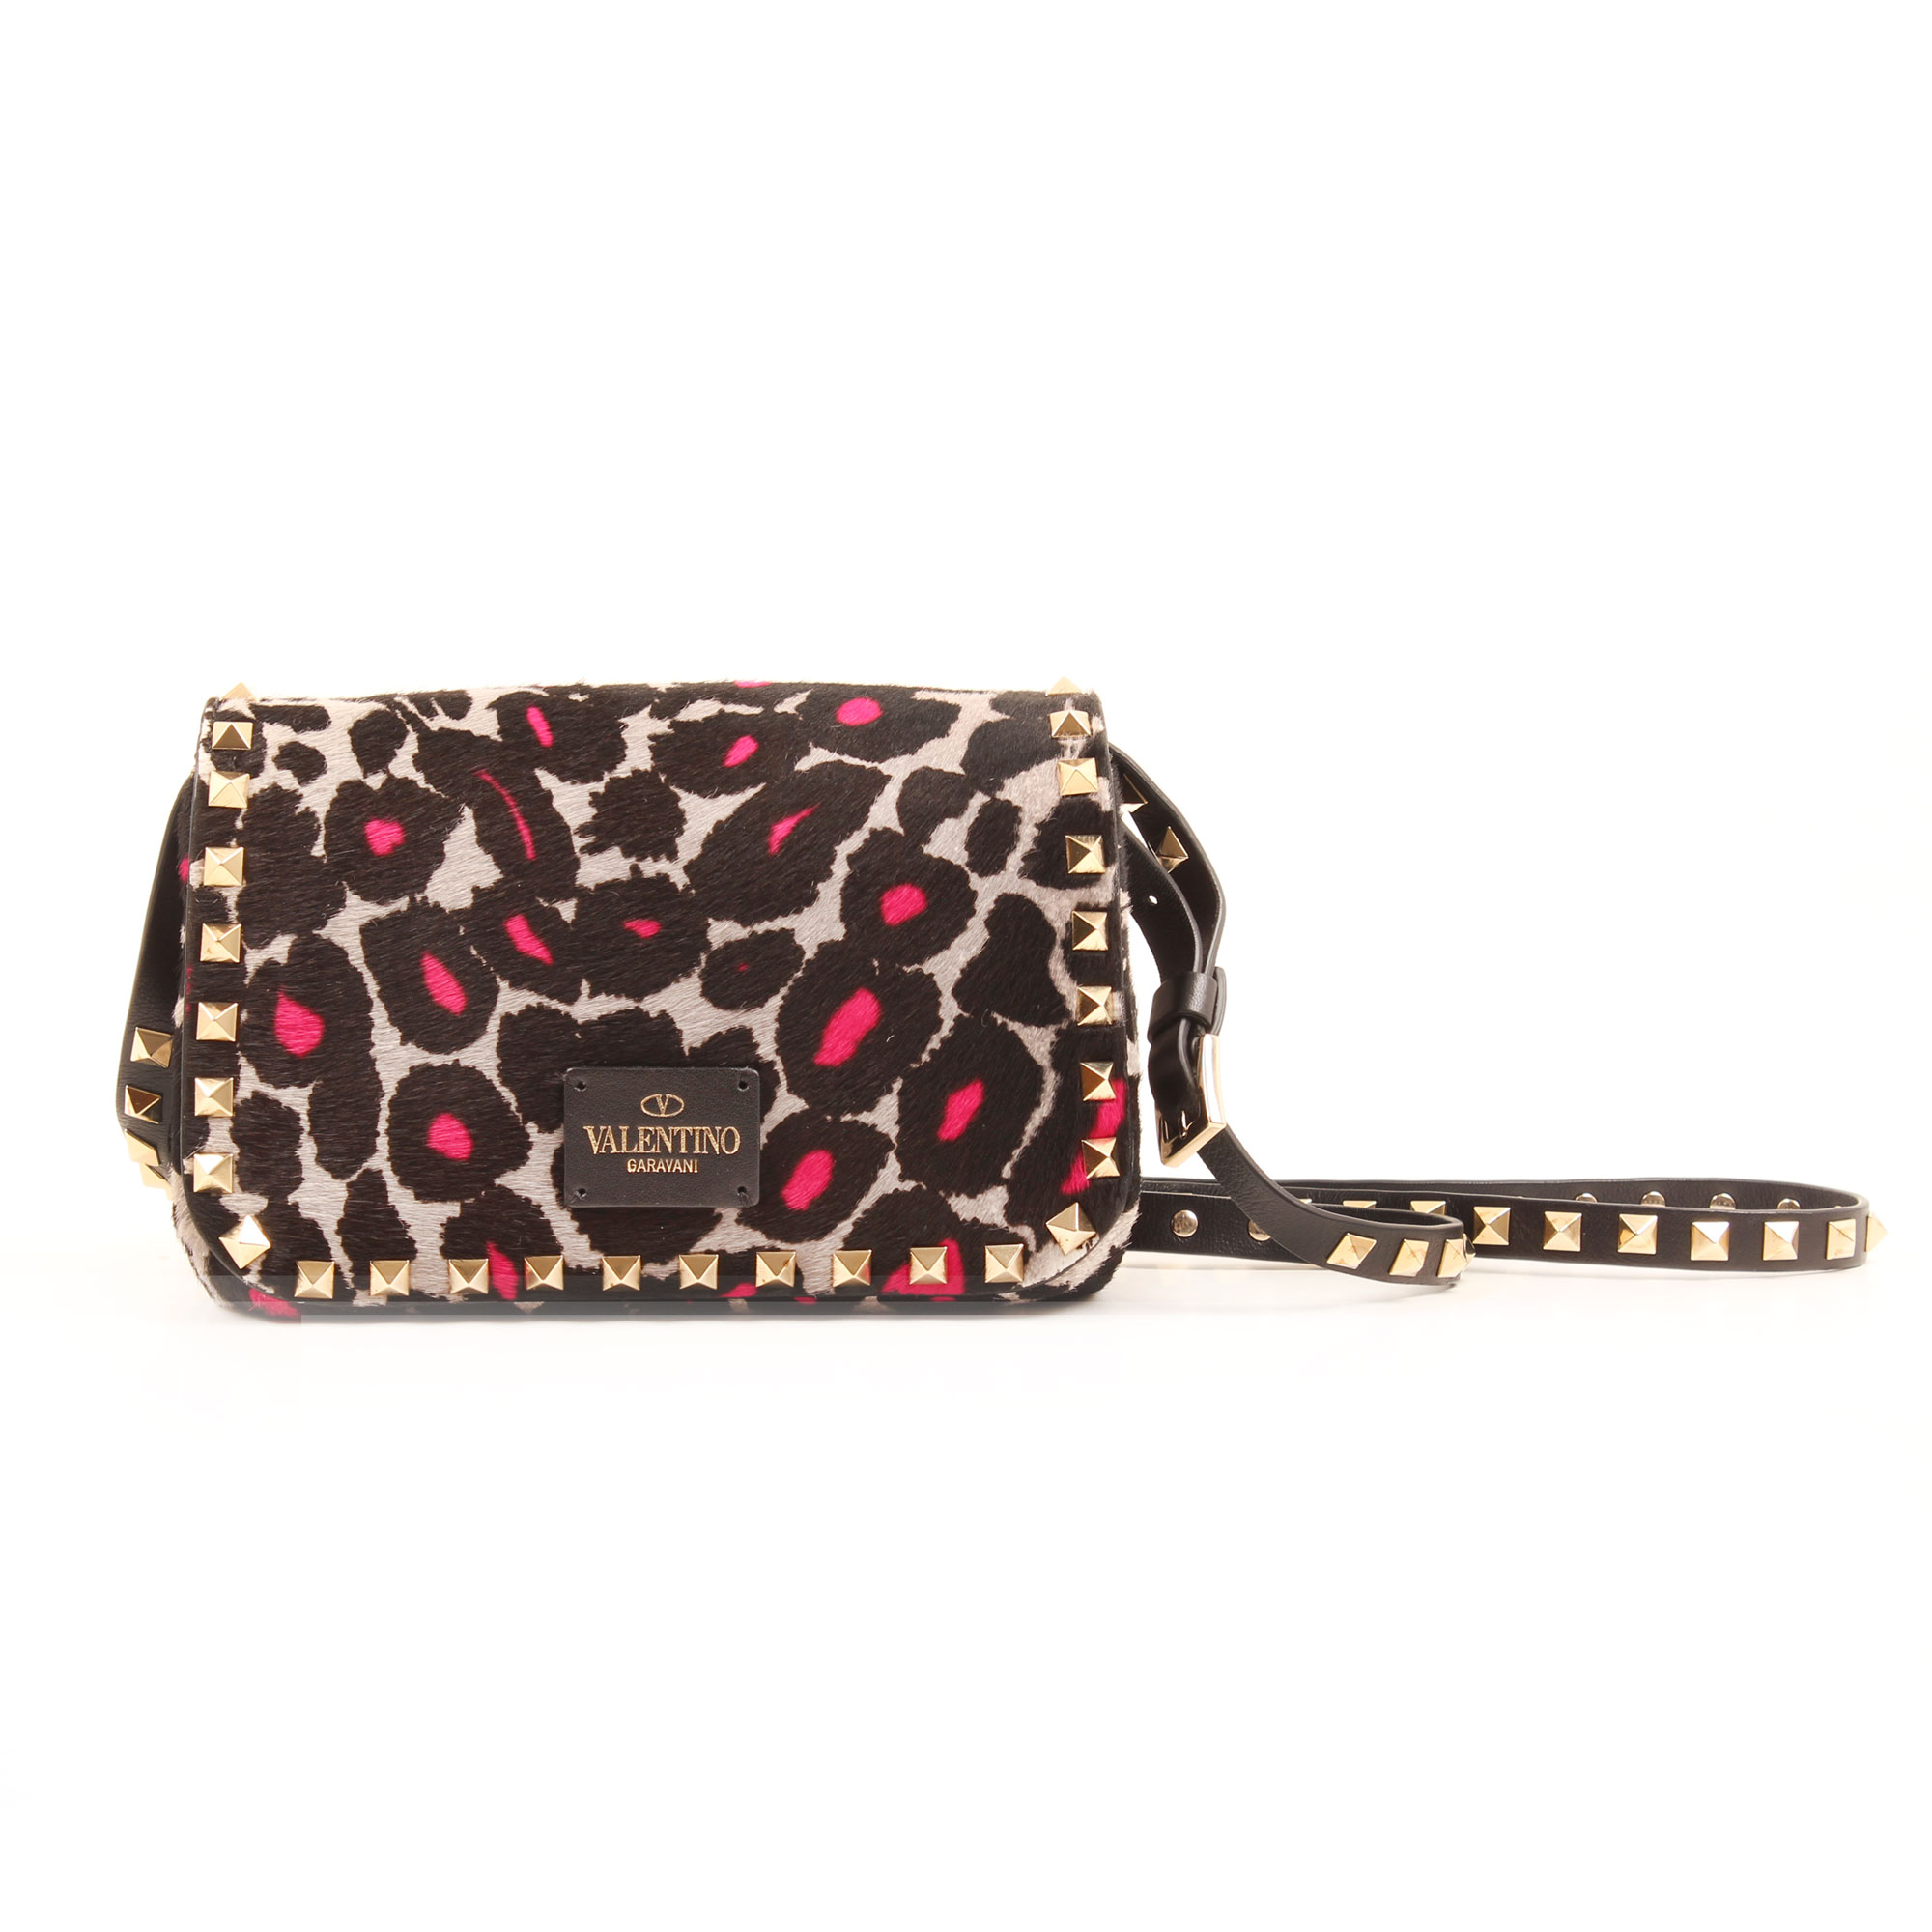 Imagen trasera del bolso valentino rockstud mini cross body leopard print pink hair calf